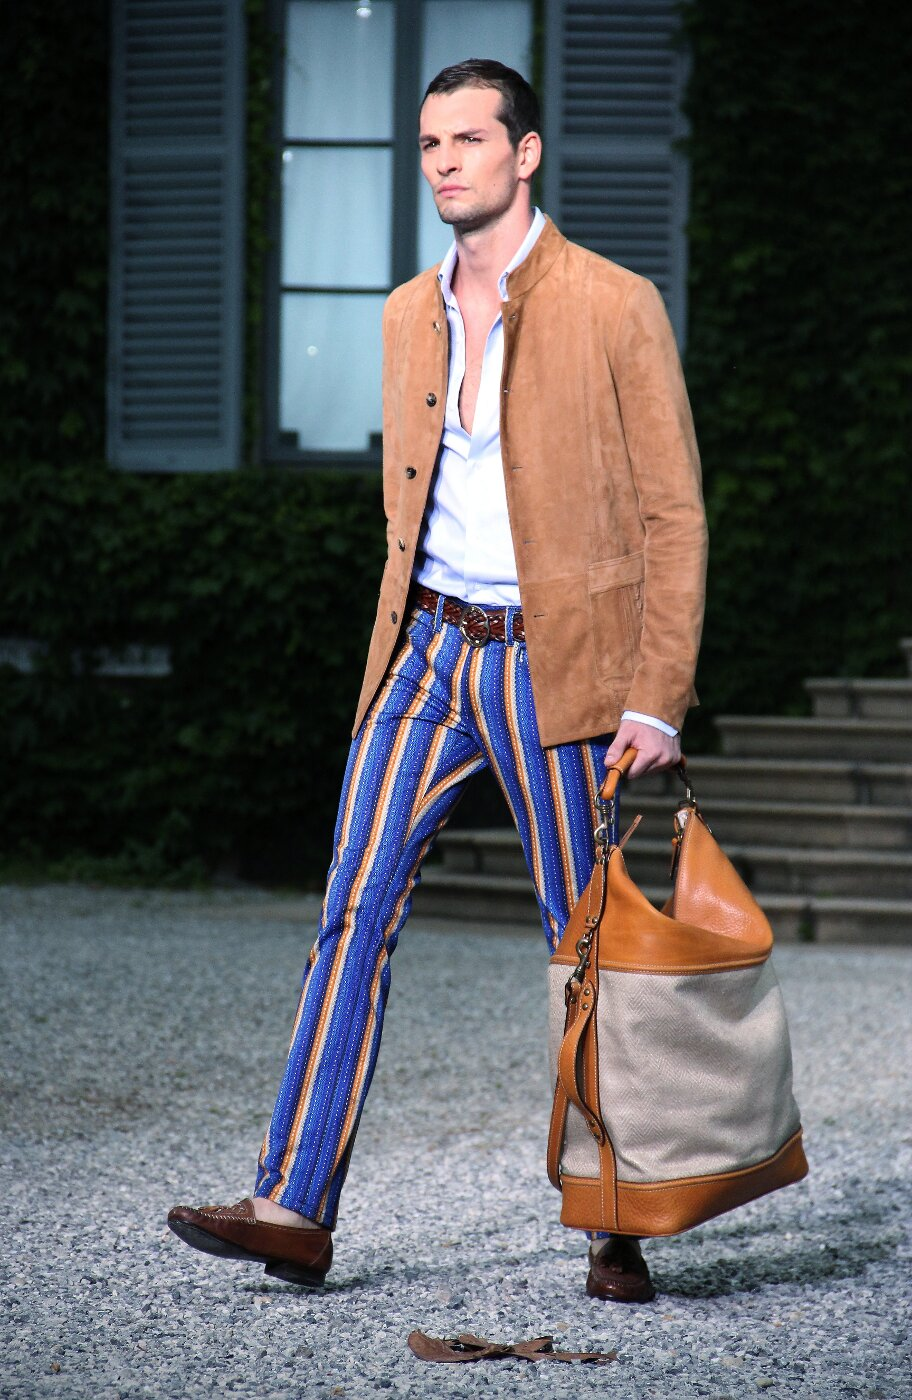 ss-roberto-cavalli-2012-ss-spring-summer-2012-milano-fashion-week